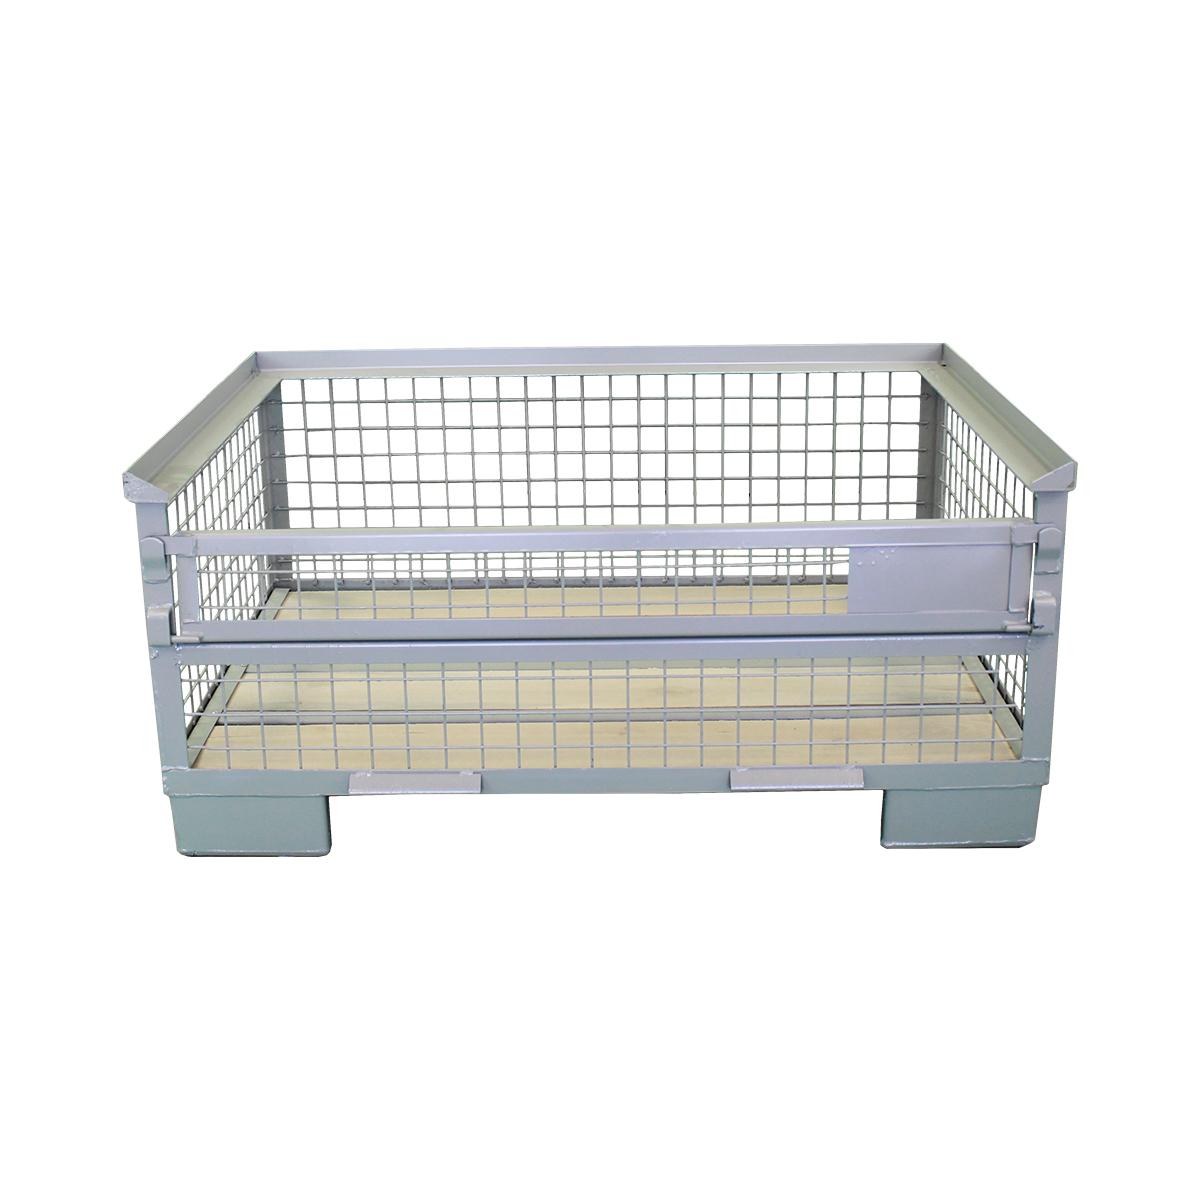 Halbhohe Industriegitterboxpalette 570 mm